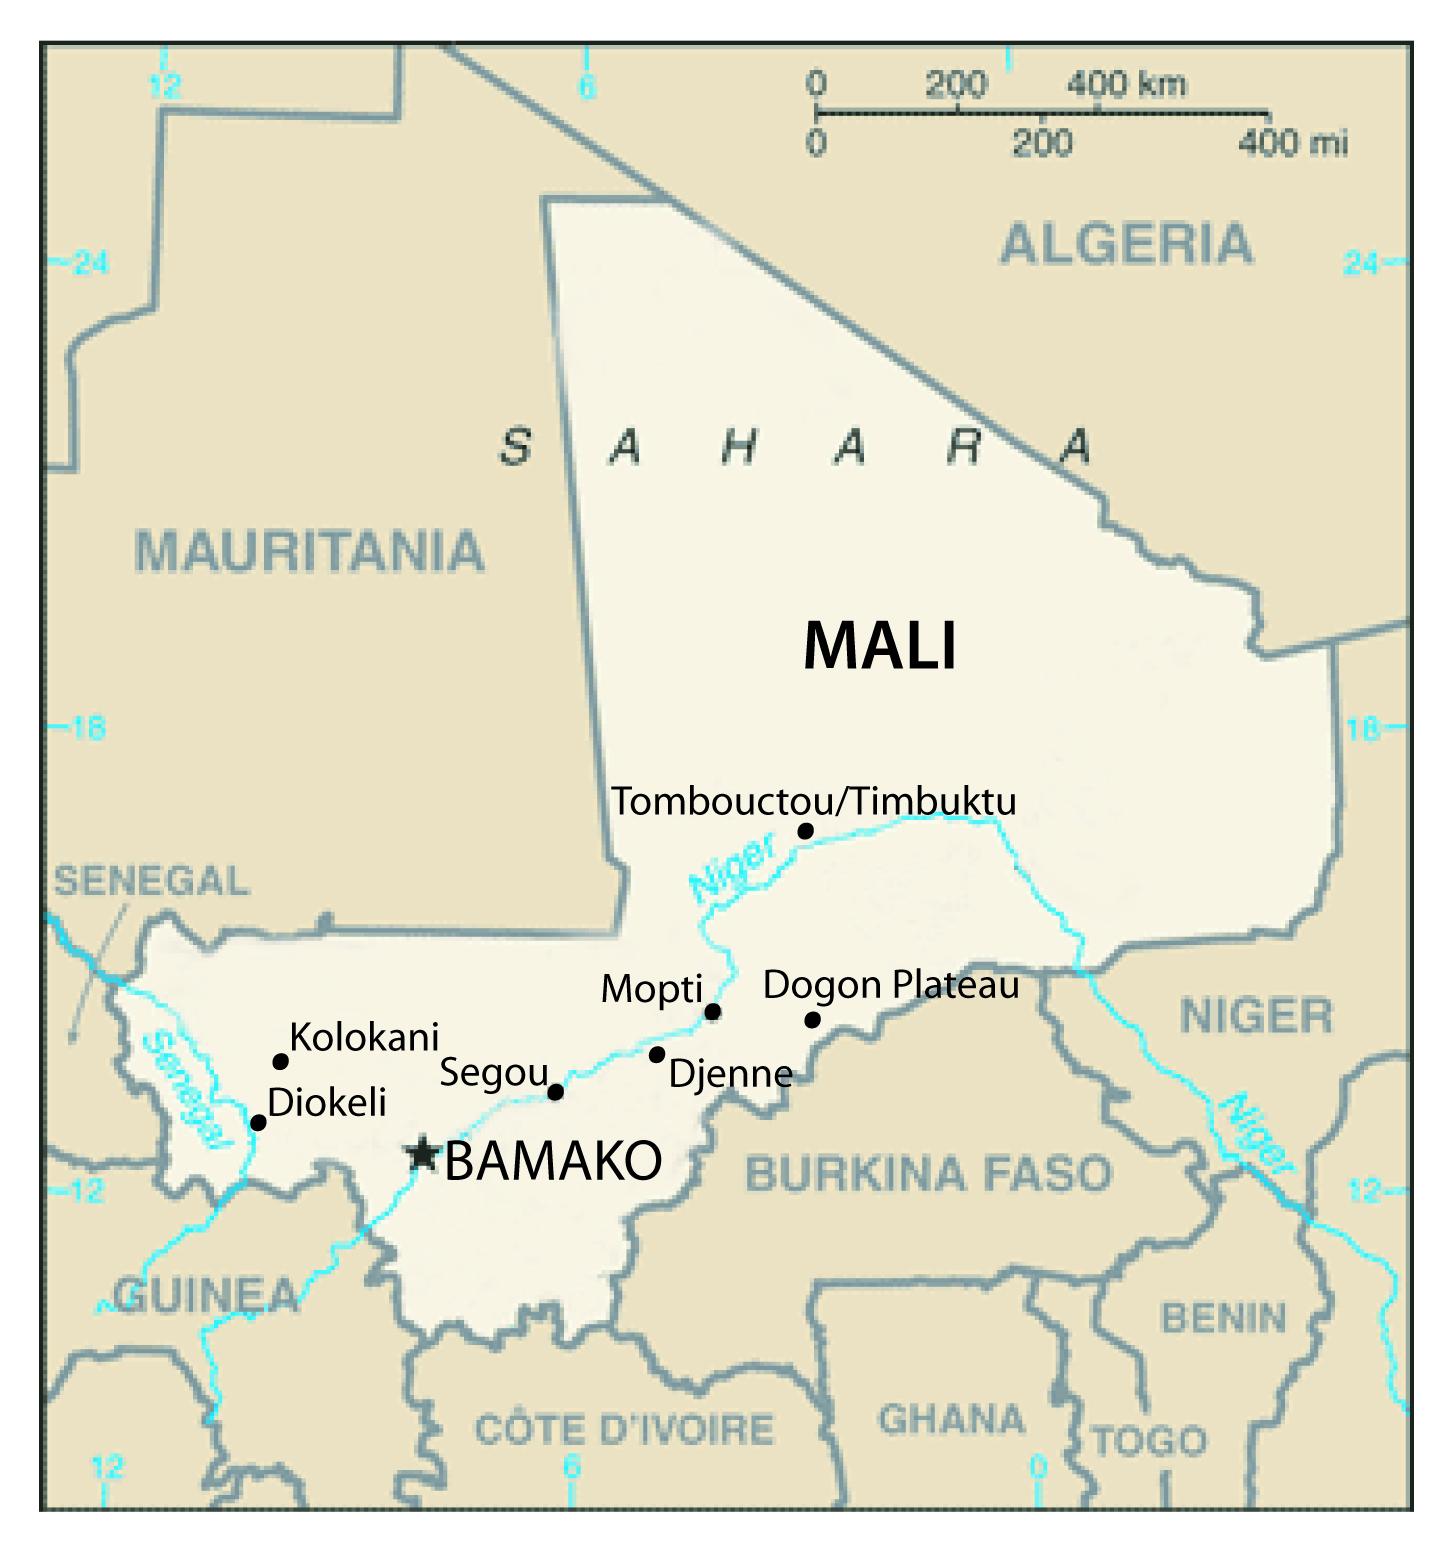 Democracy and Class Struggle Mali and AFRICOM s Africa Agenda Target China